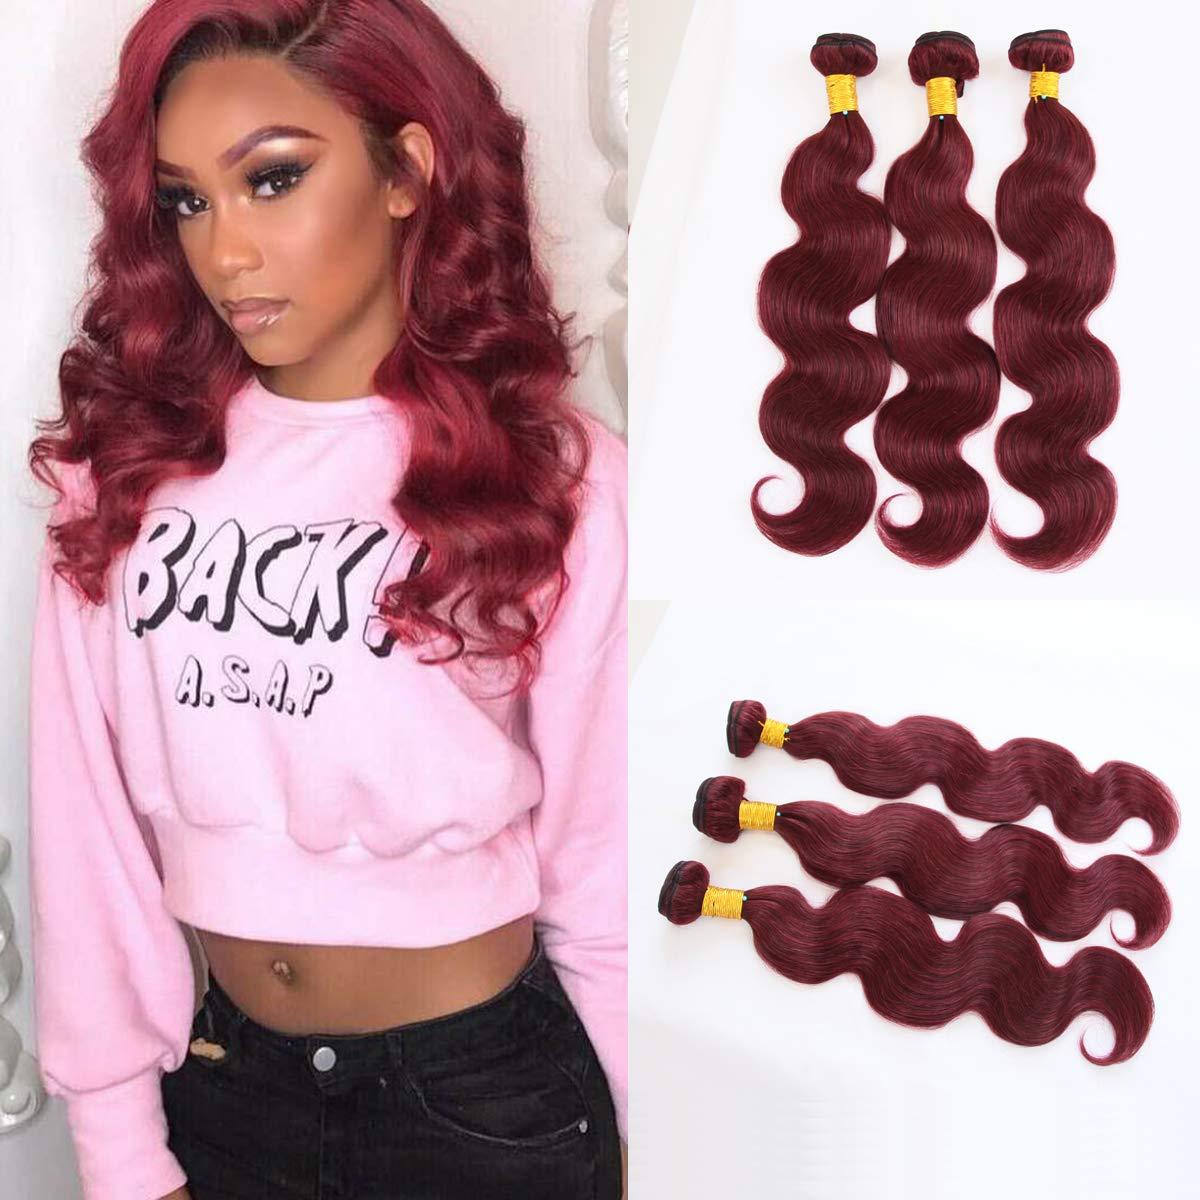 New Free Shipping Dorabeauty Human Indefinitely Hair Bundles #99J Wine Wave 10 Body Red